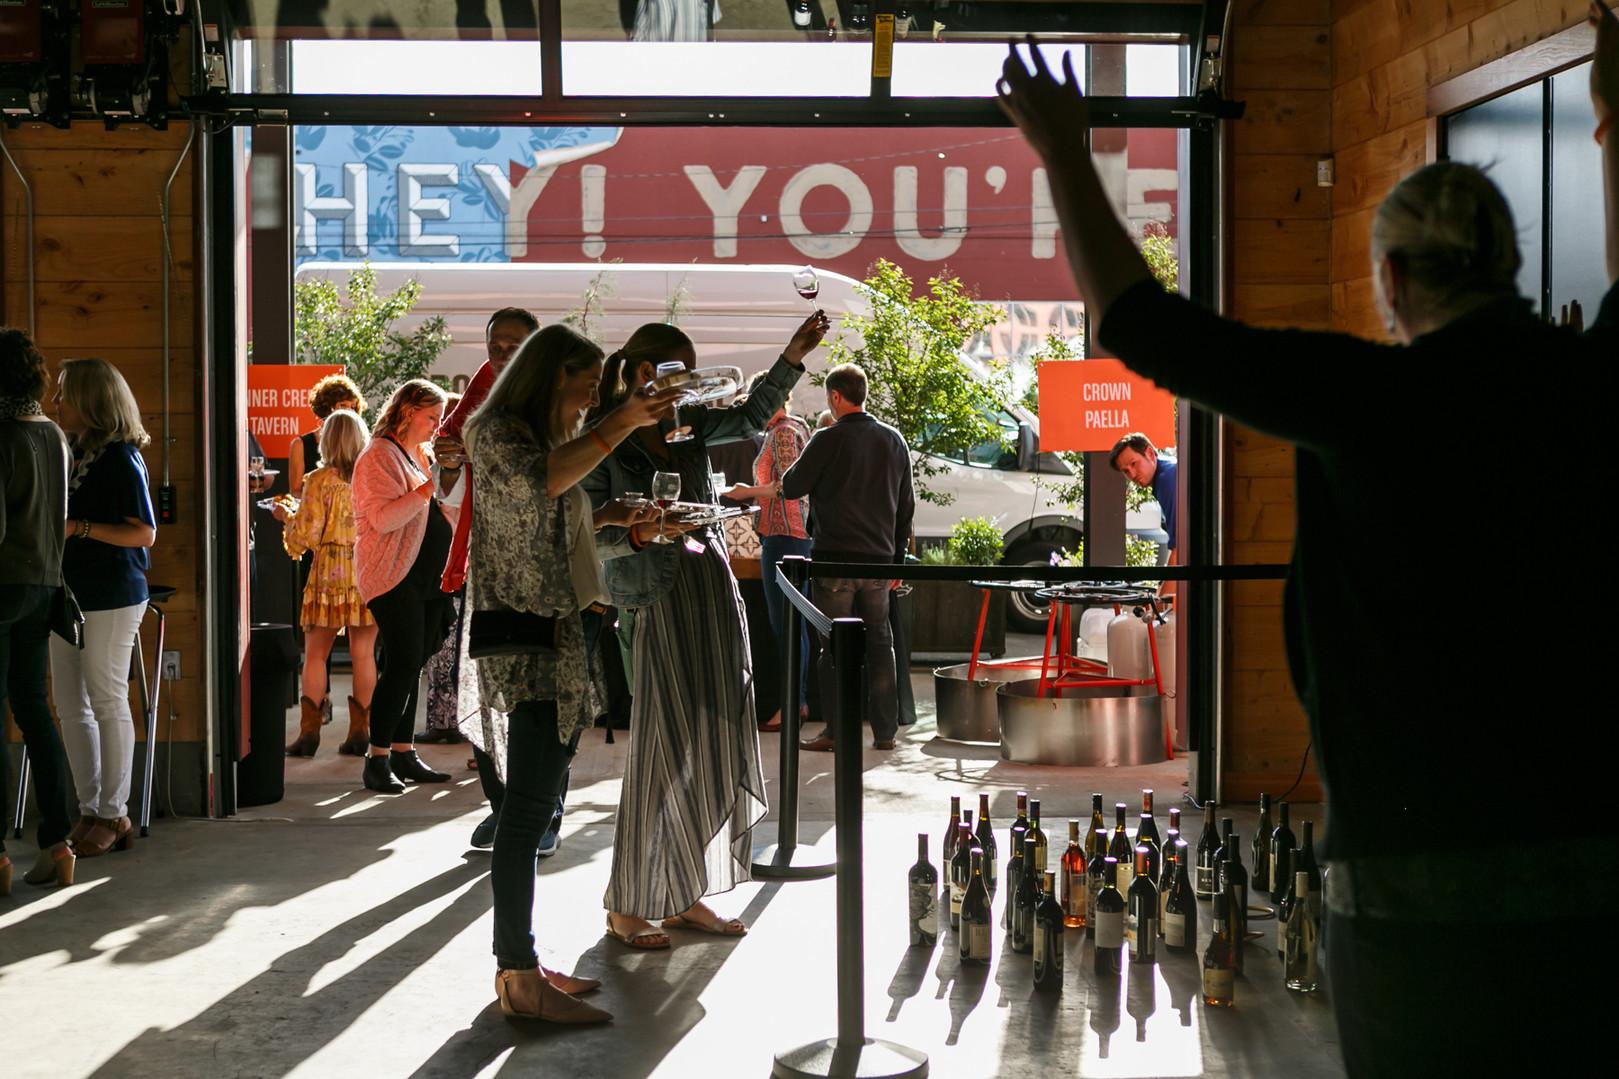 Wine Toss Fundraiser game near the garage doors in Redd Main Hall